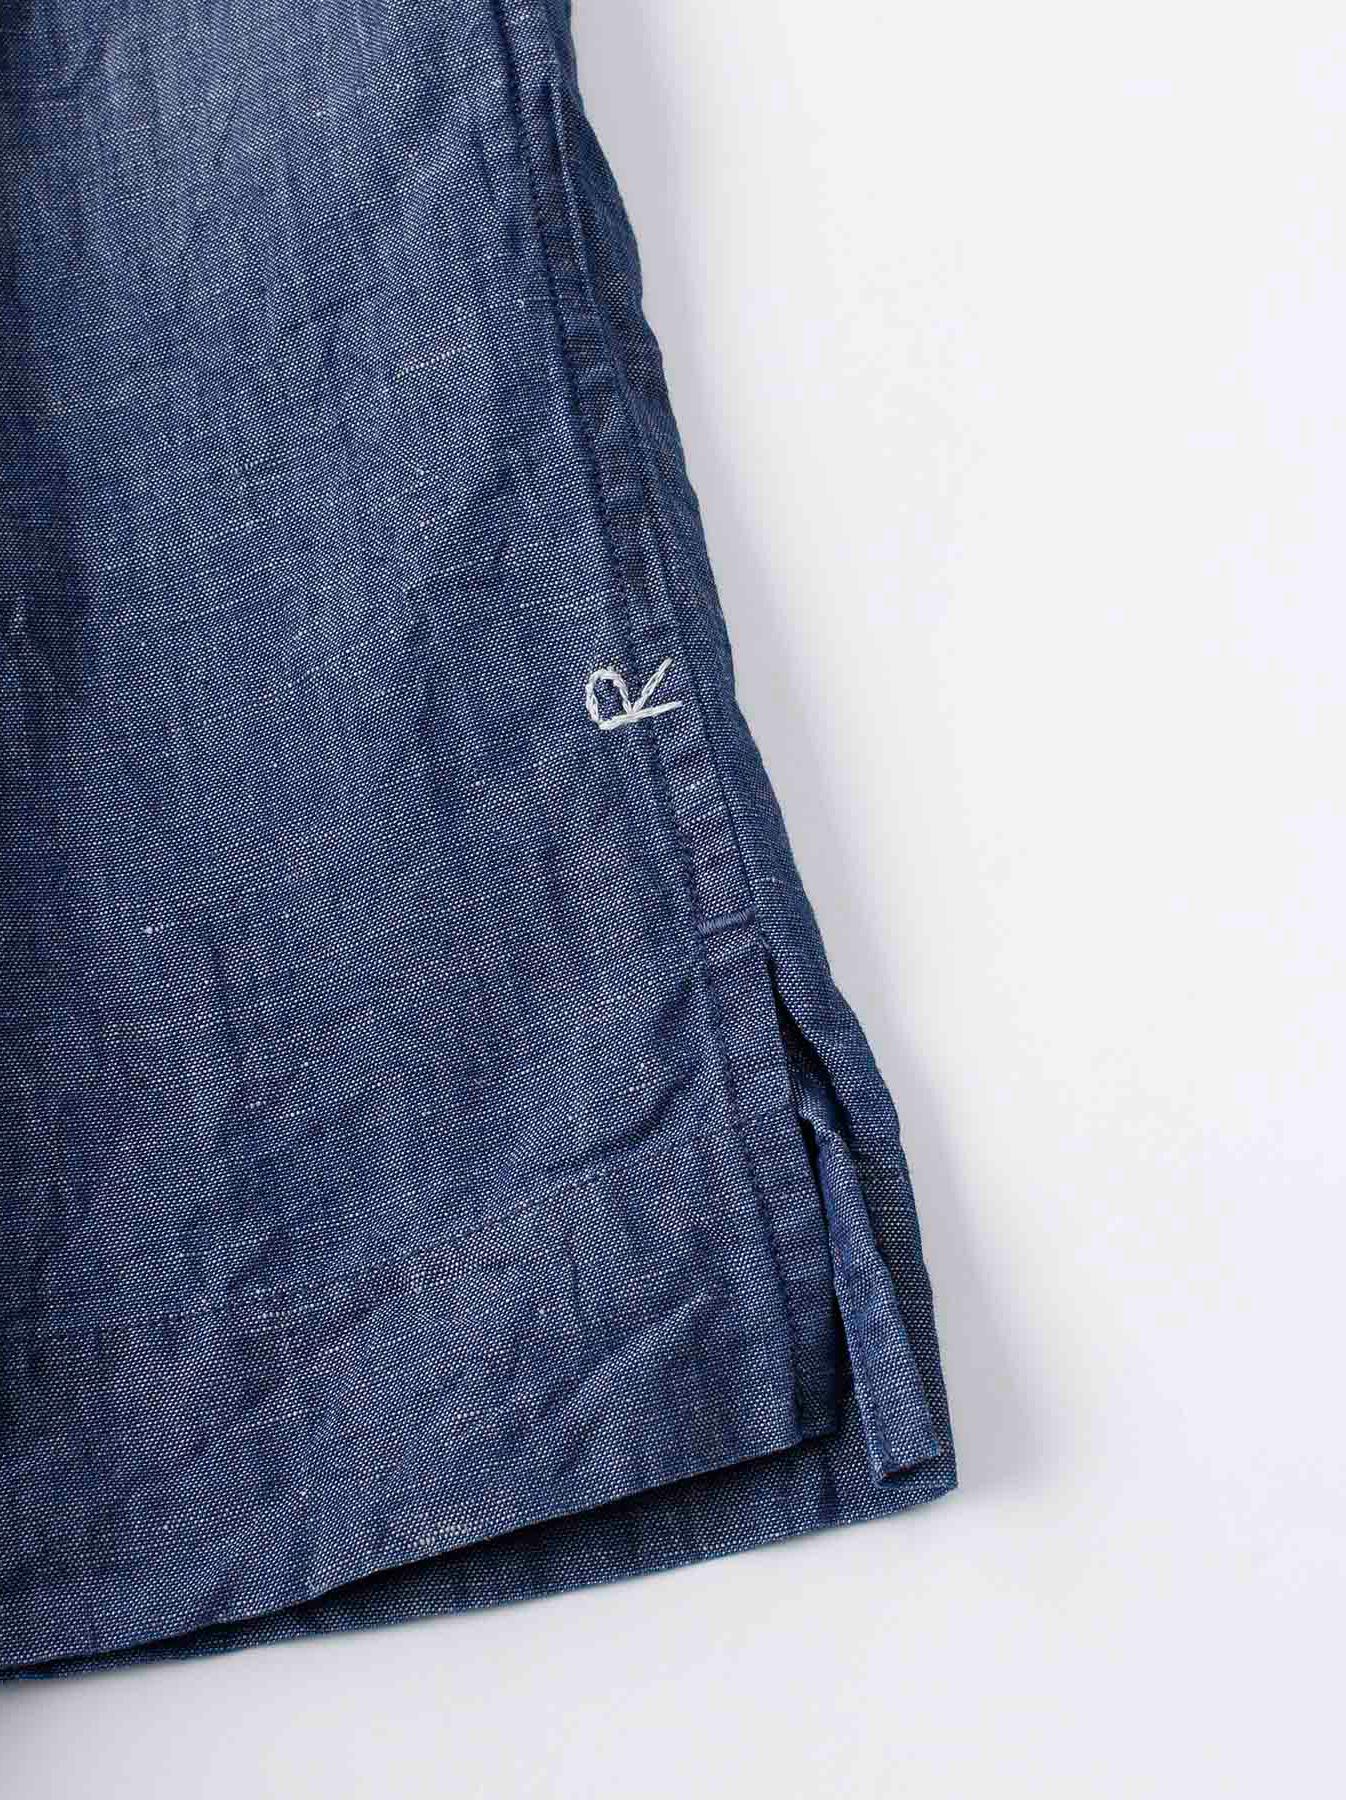 WH Cotton Linen Umahiko Pullover Shirt-10